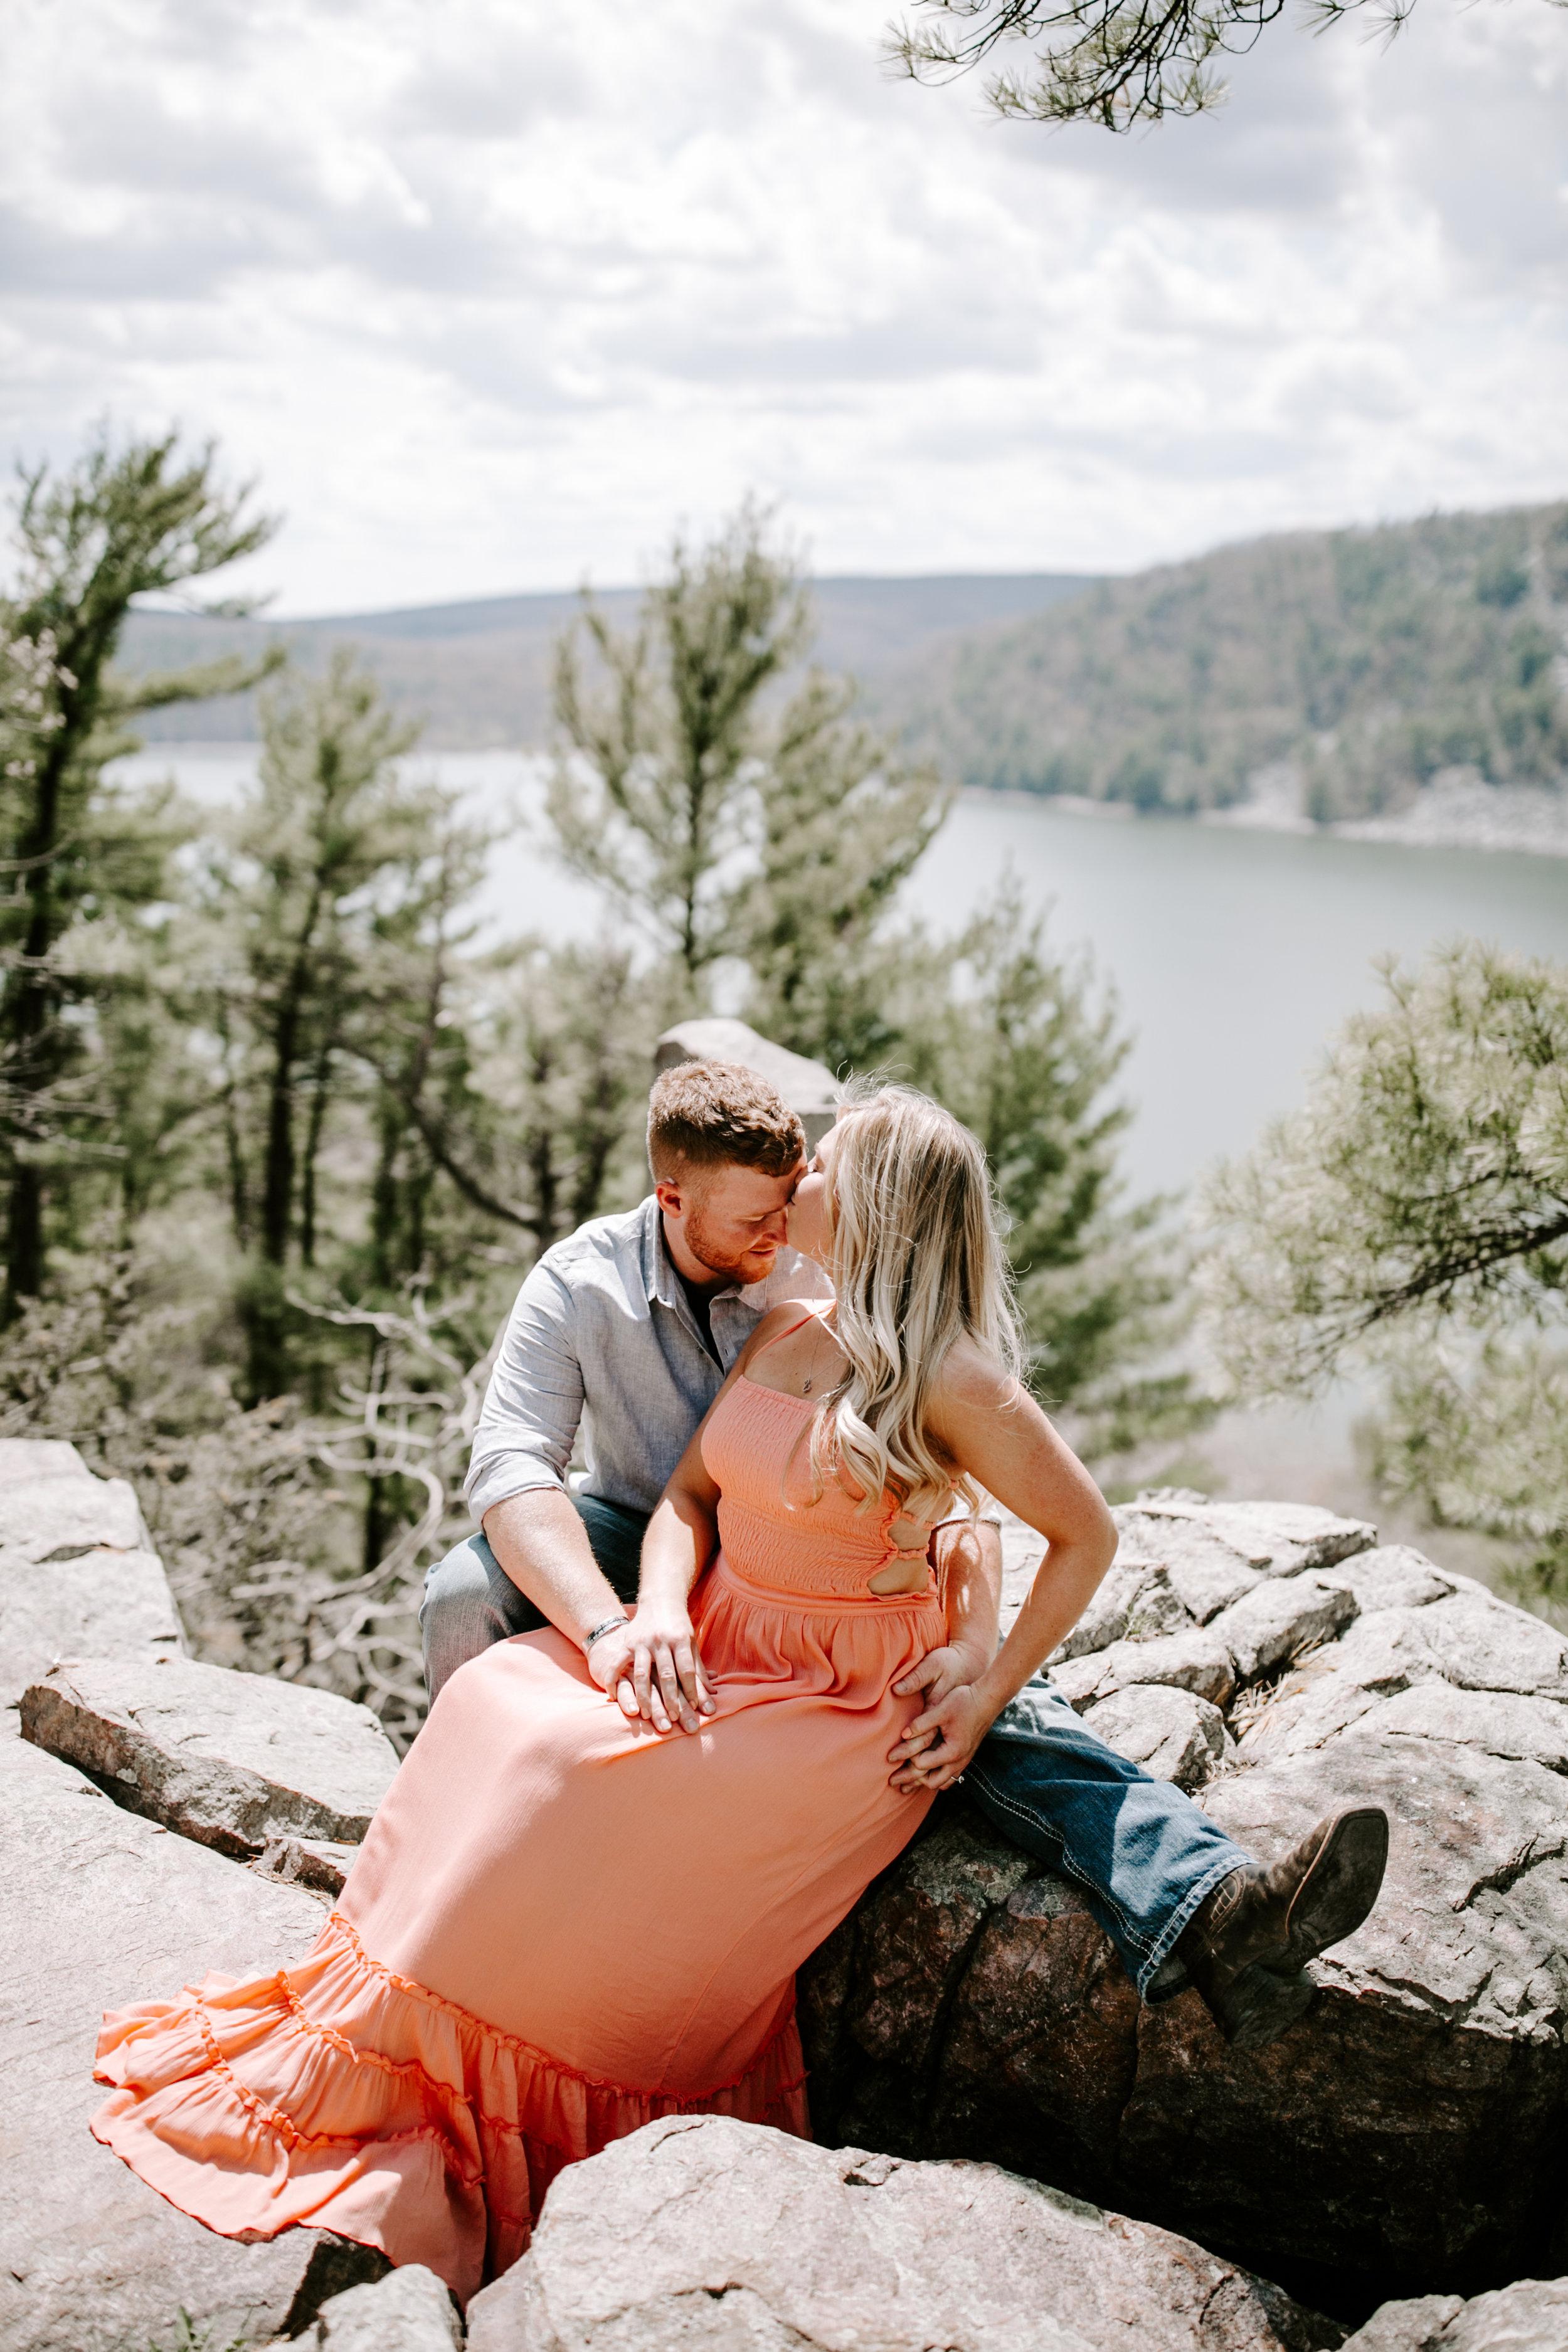 gracetphotography-wedding-photographer-adventure-bride-engagement-5.jpg